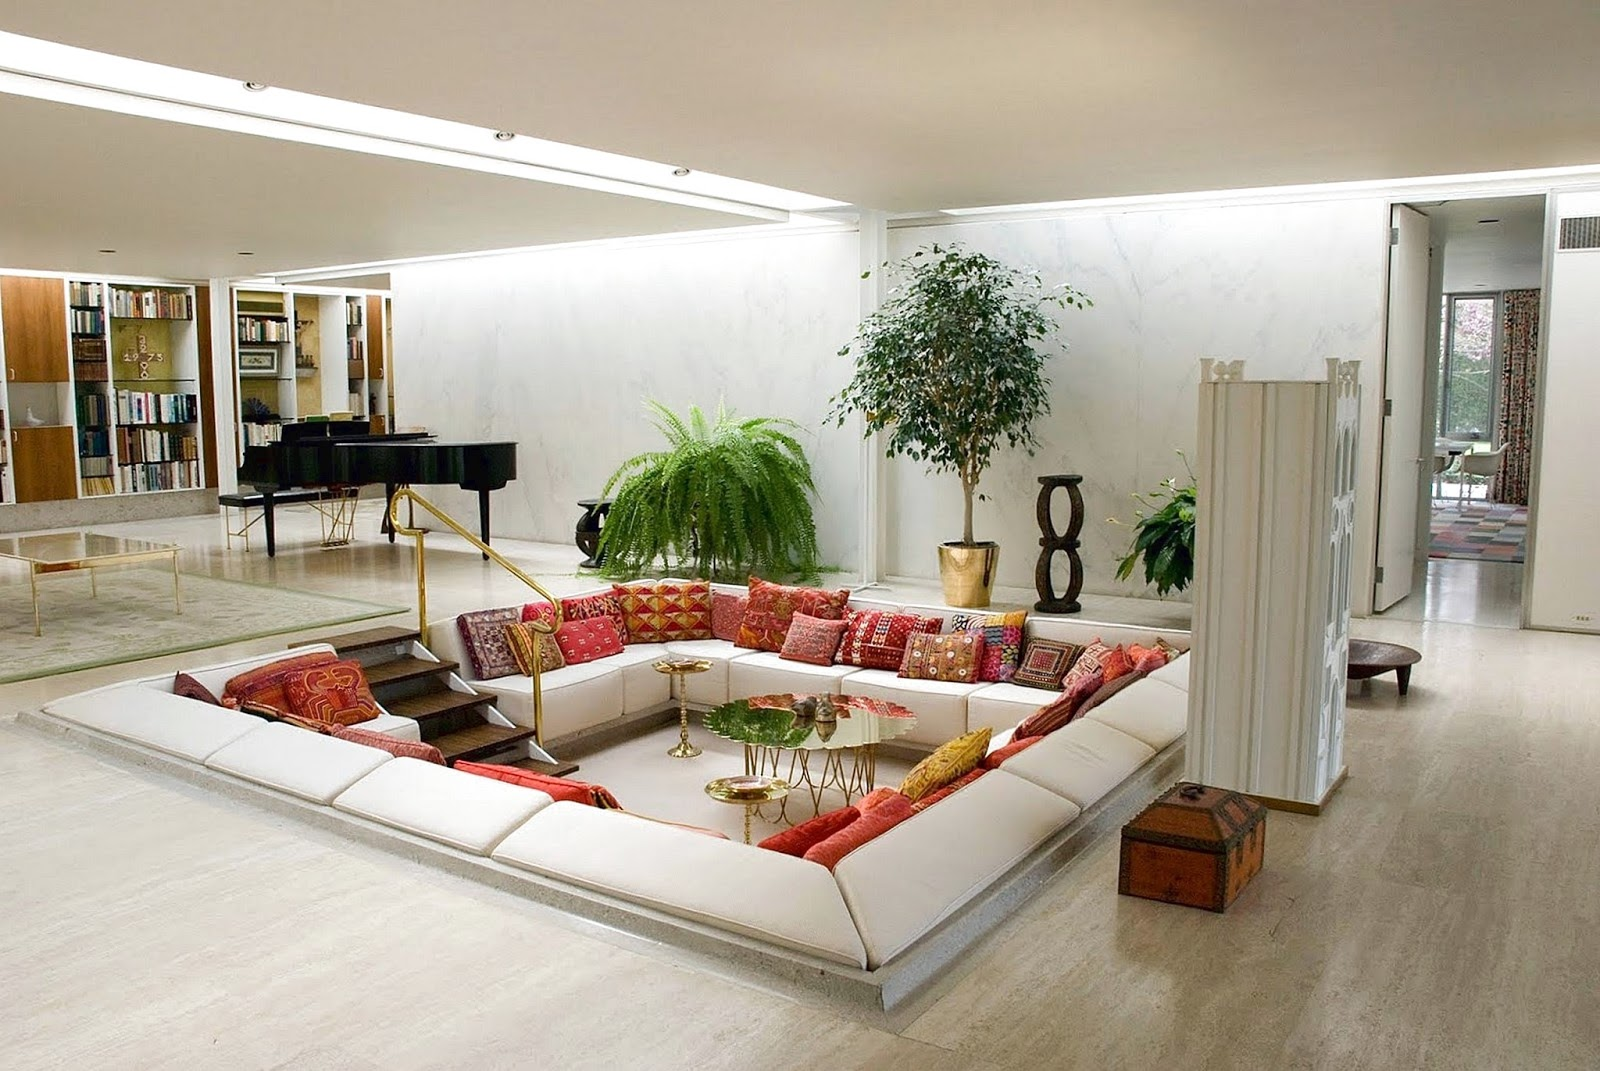 4 Reasons you Should Build a Sunken Living Room - Anastasia Home